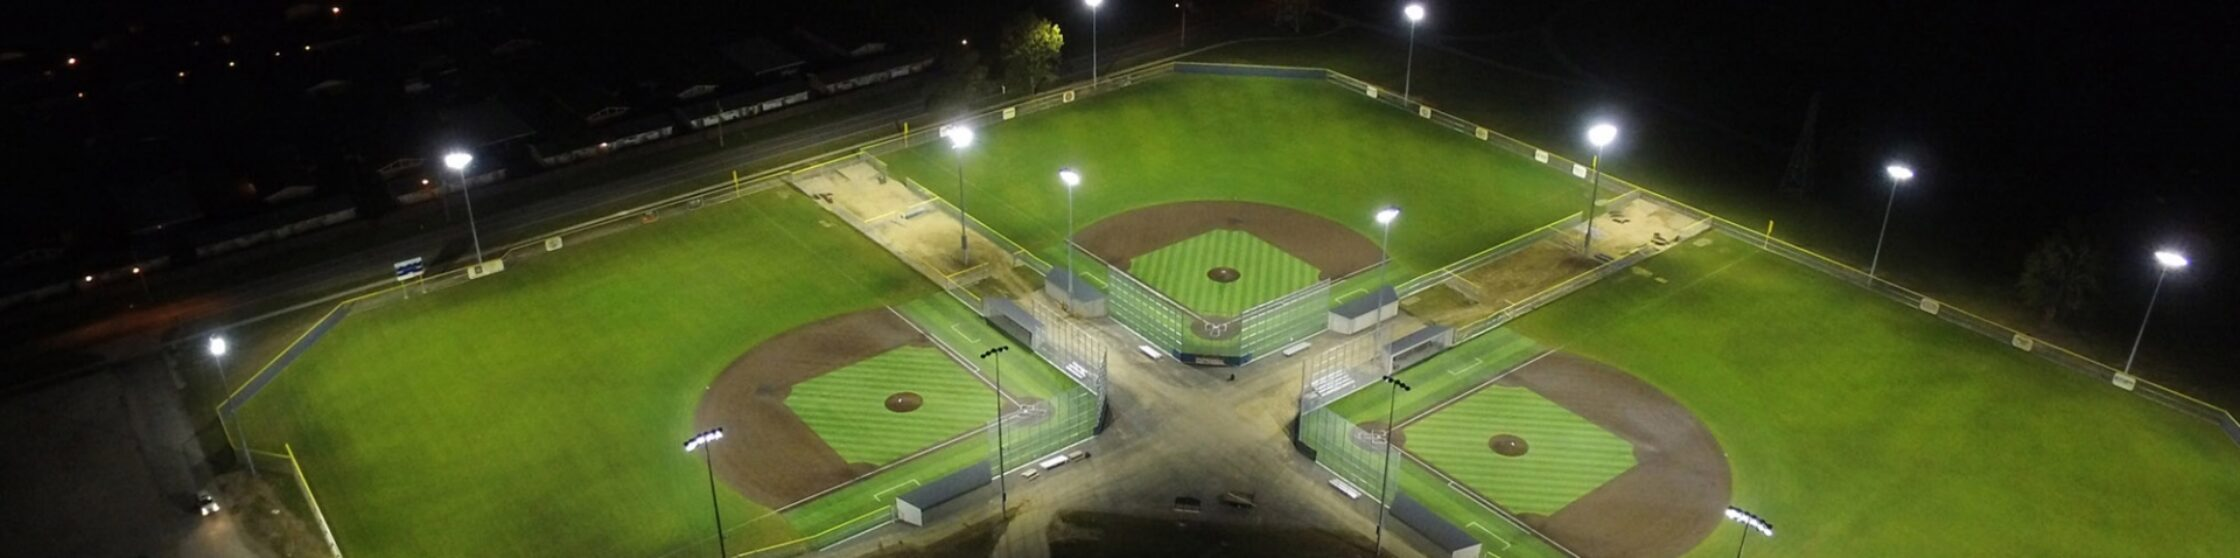 Ash Centre World Baseball Academy Fields Fort Wayne